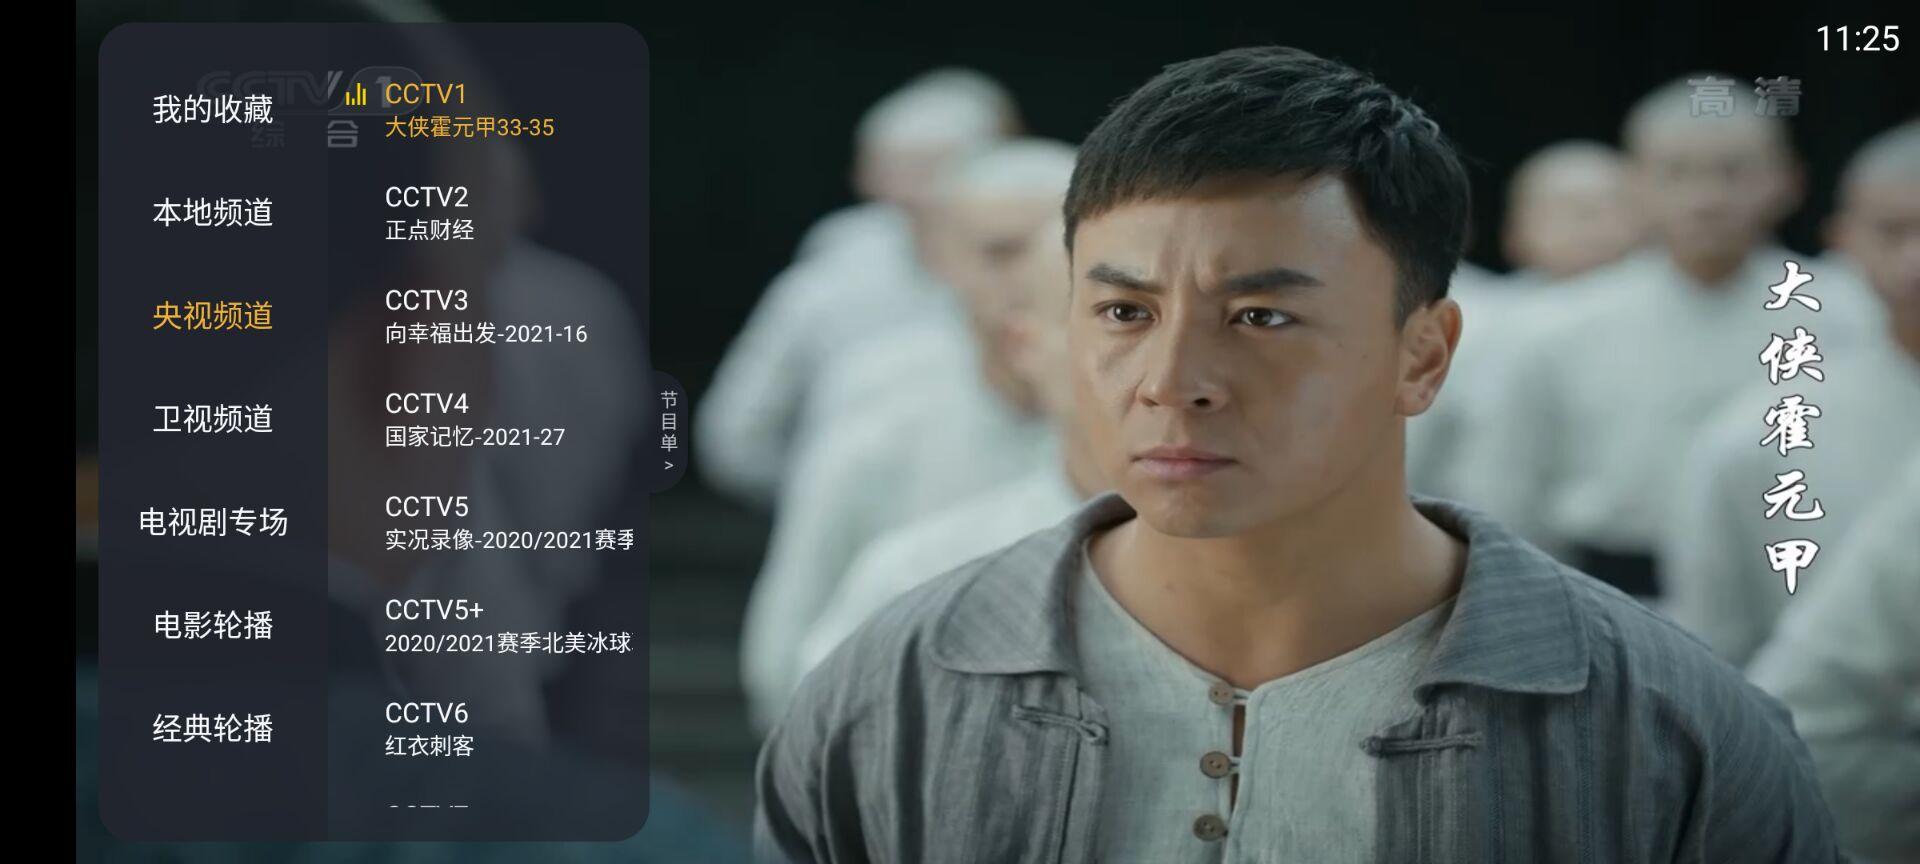 Android i看TV v1.0.6 去广告纯净版-QQ前线乐园